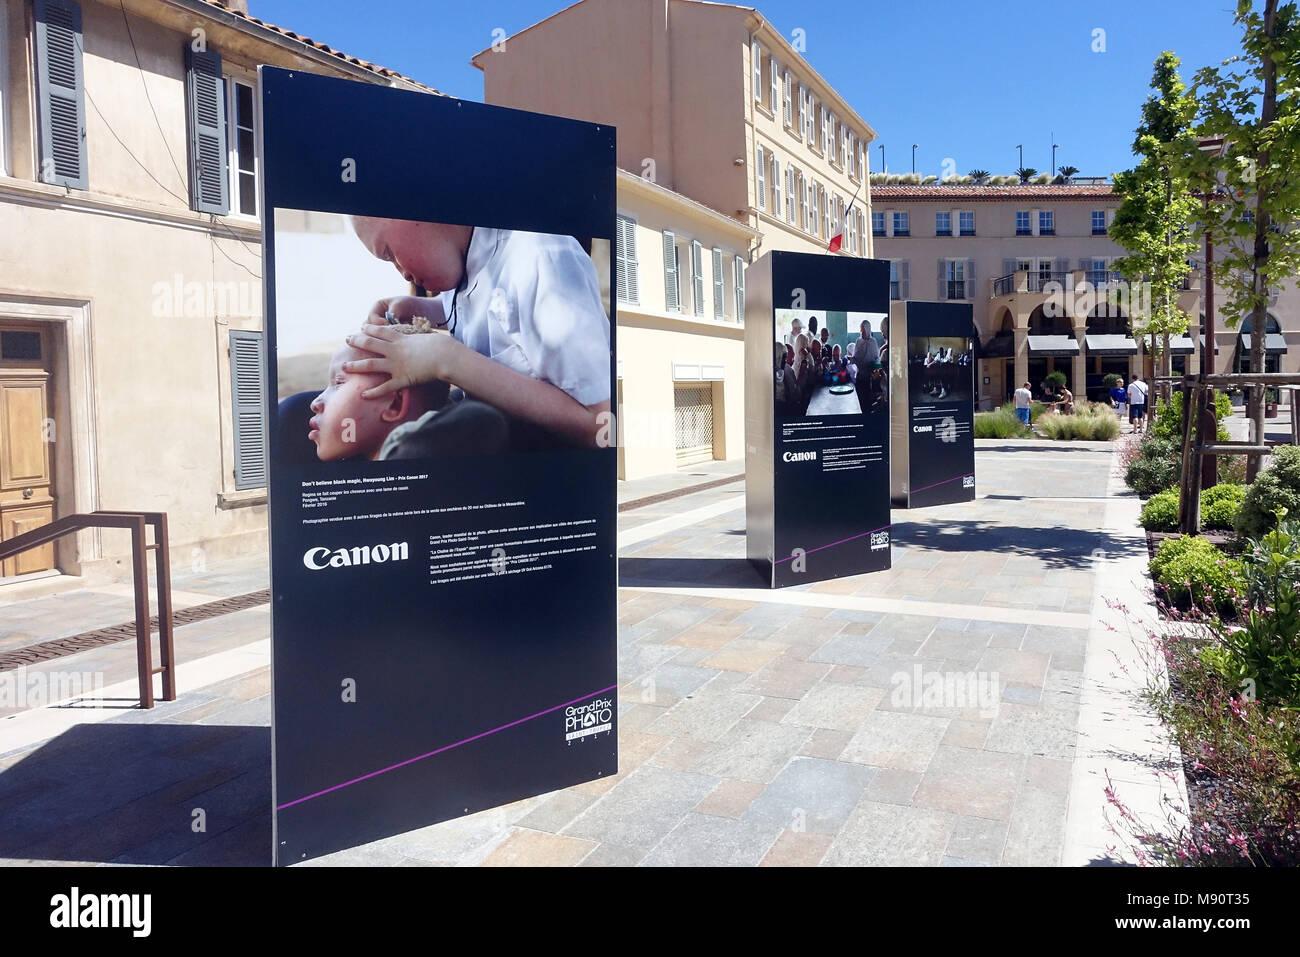 Grand Prix Foto de Saint-Tropez. Ausstellung von Canon. Stockbild